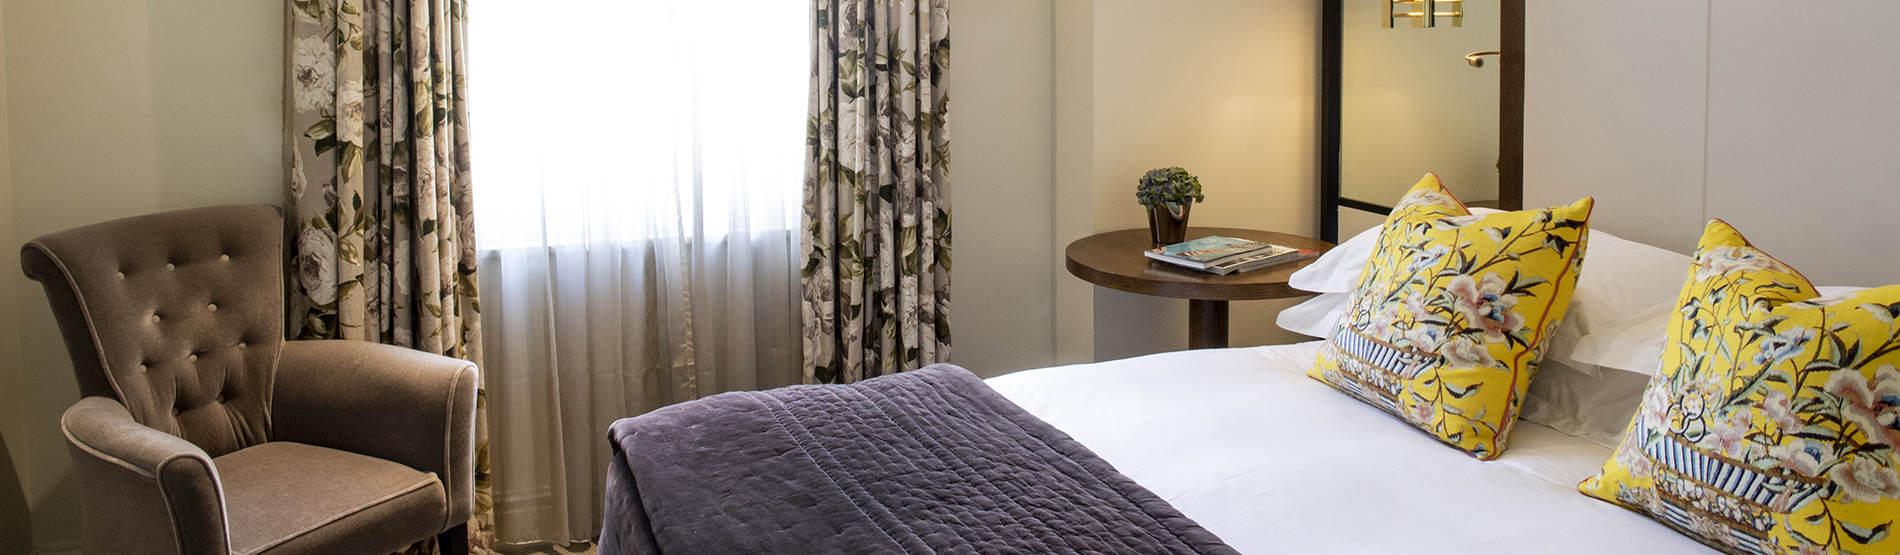 Hotel Rooms Kensington Classic Queen The Kensington